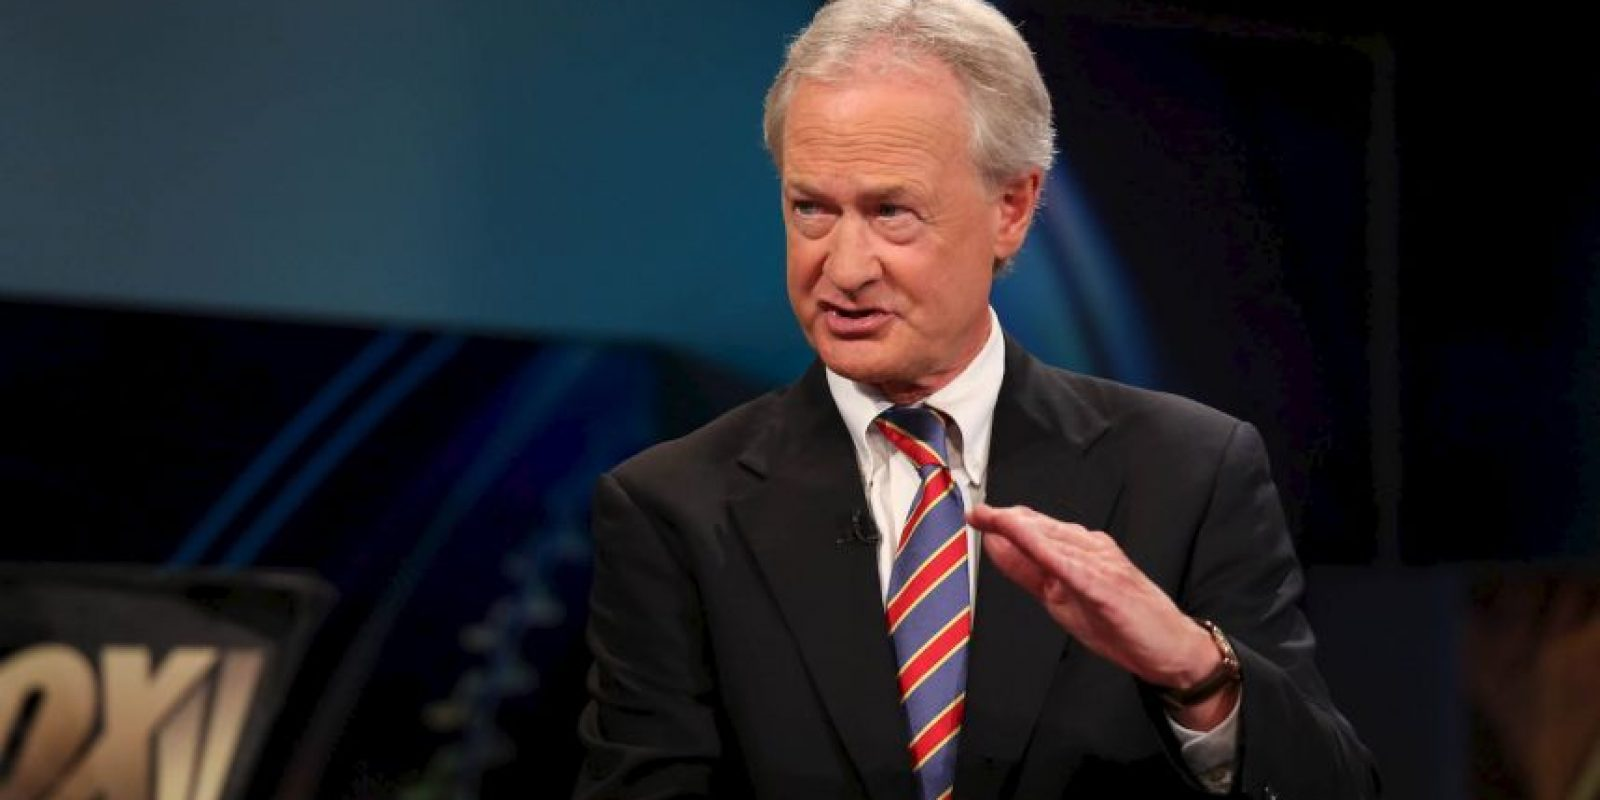 Fue el gobernador de Rhode Island de 2011 a 2015. Foto:Getty Images